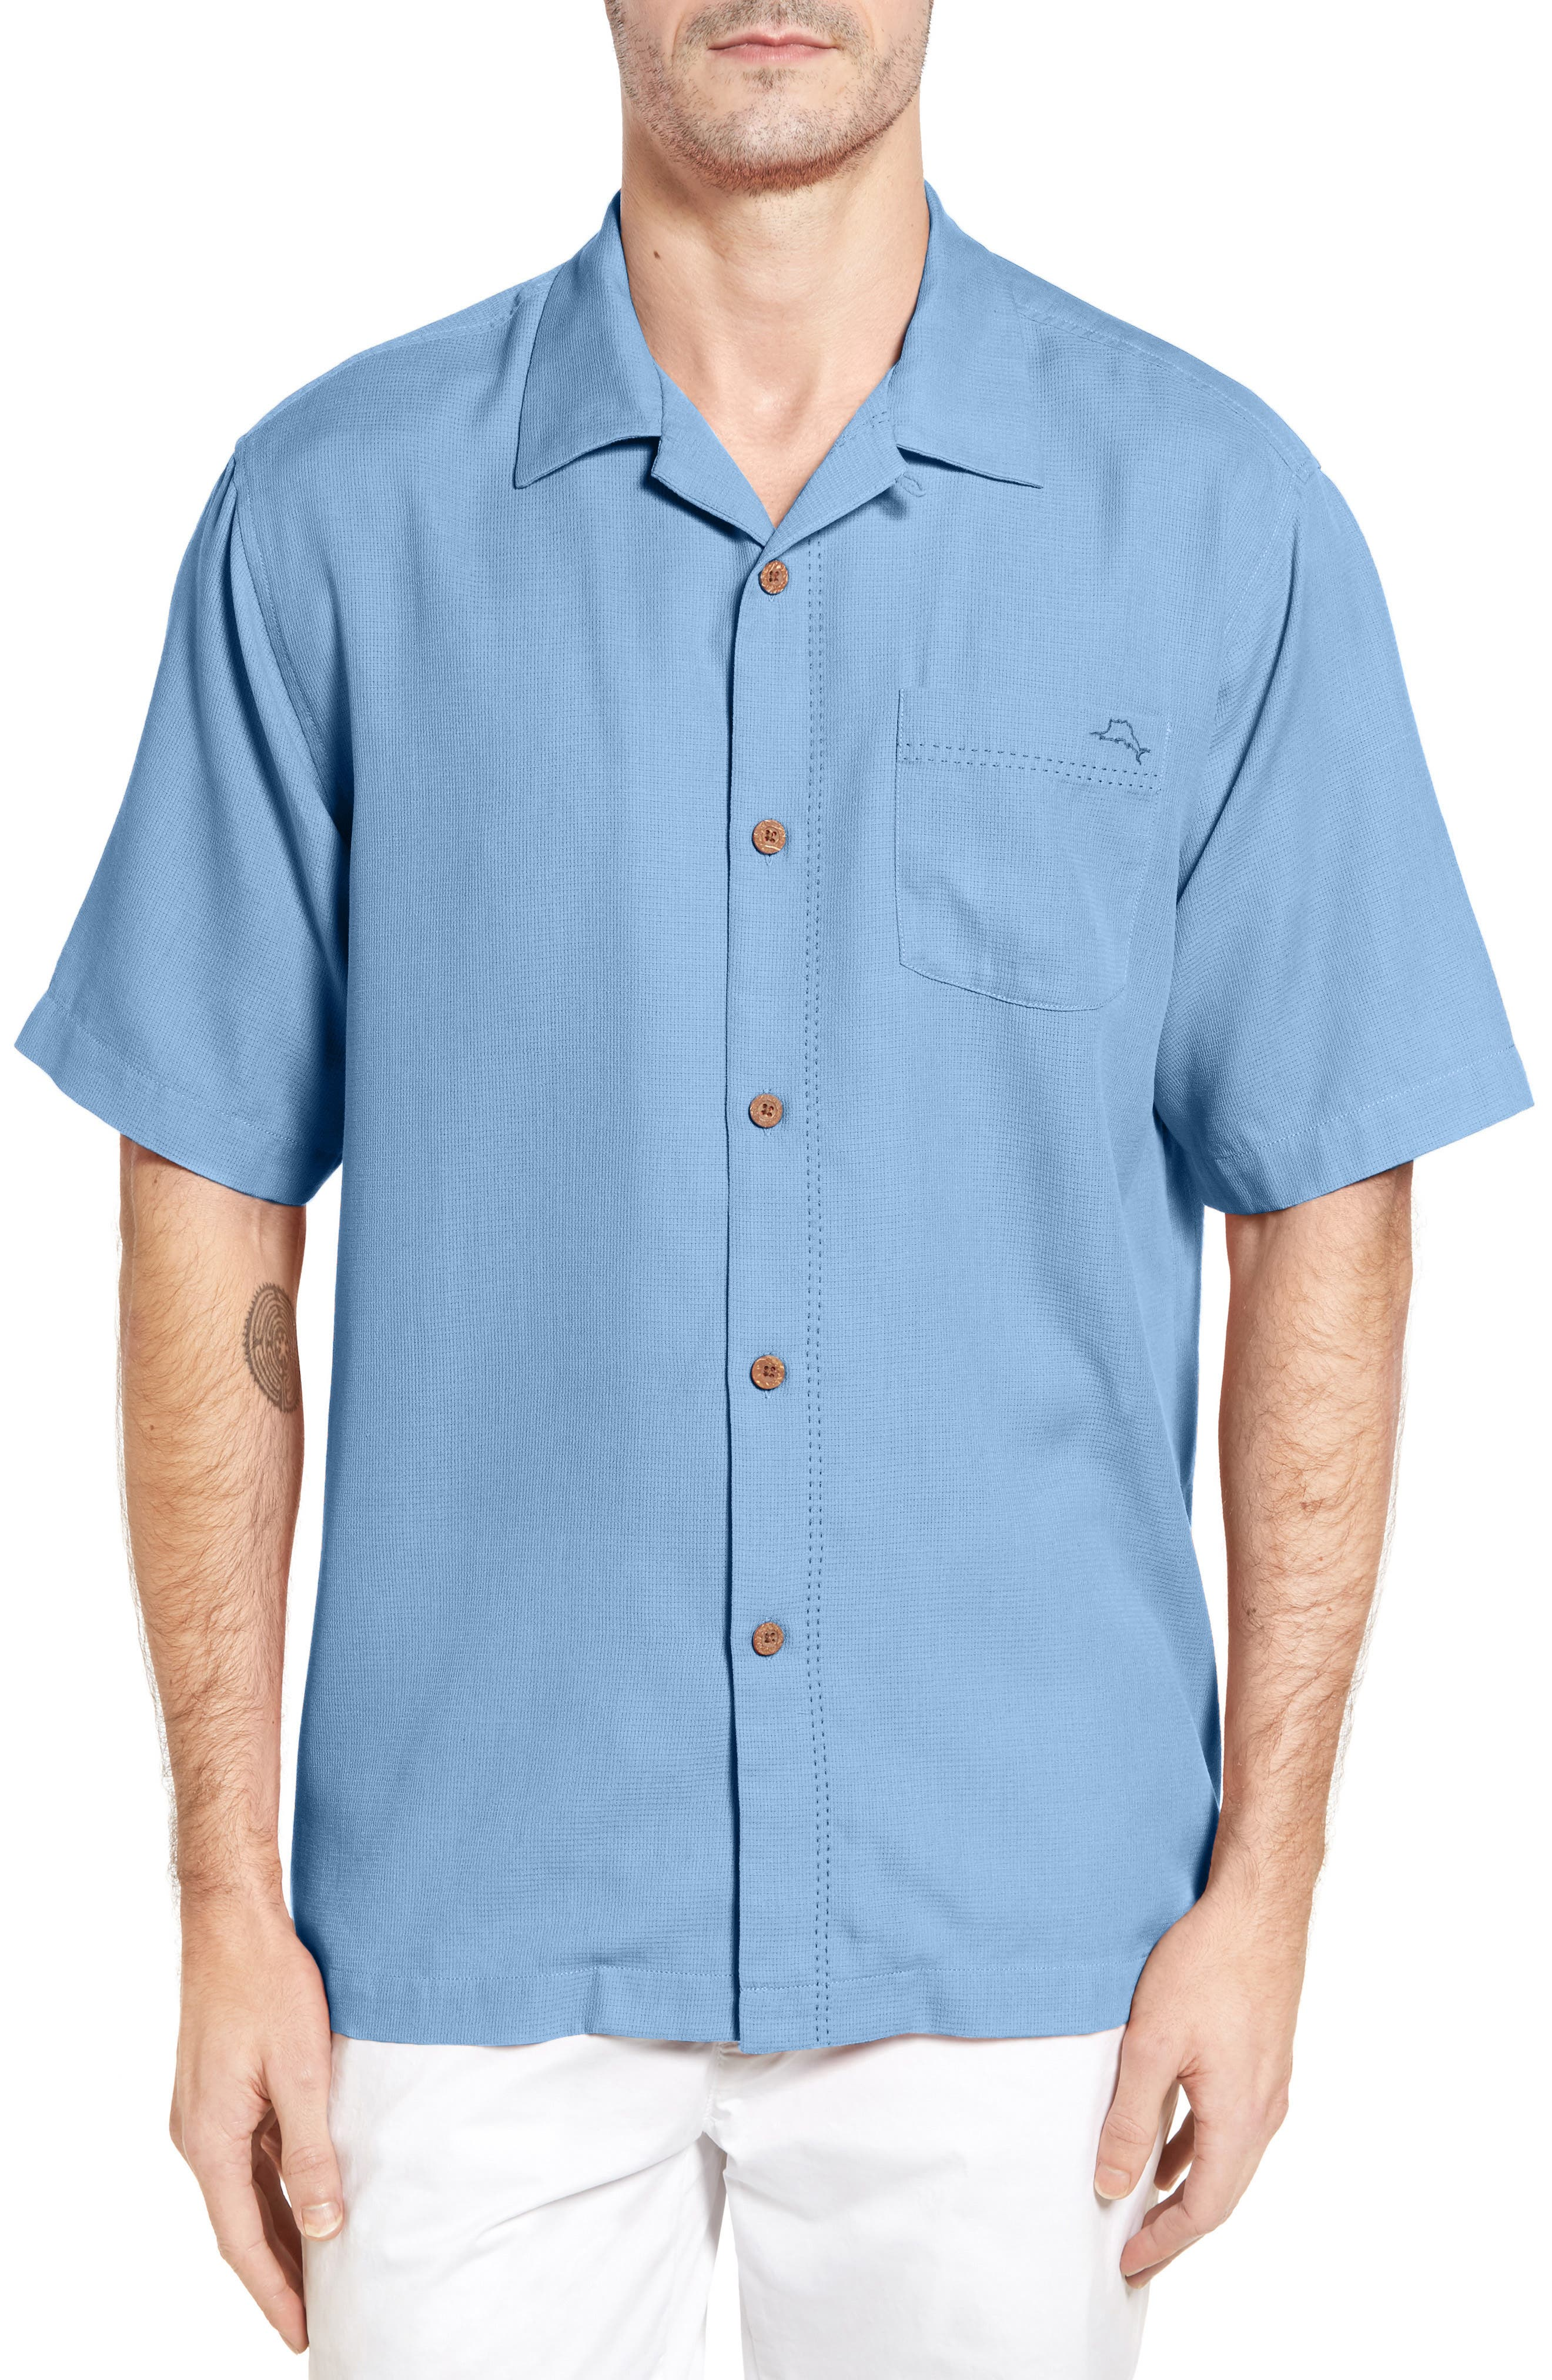 Alternate Image 1 Selected - Tommy Bahama Royal Bermuda Standard Fit Silk Blend Camp Shirt